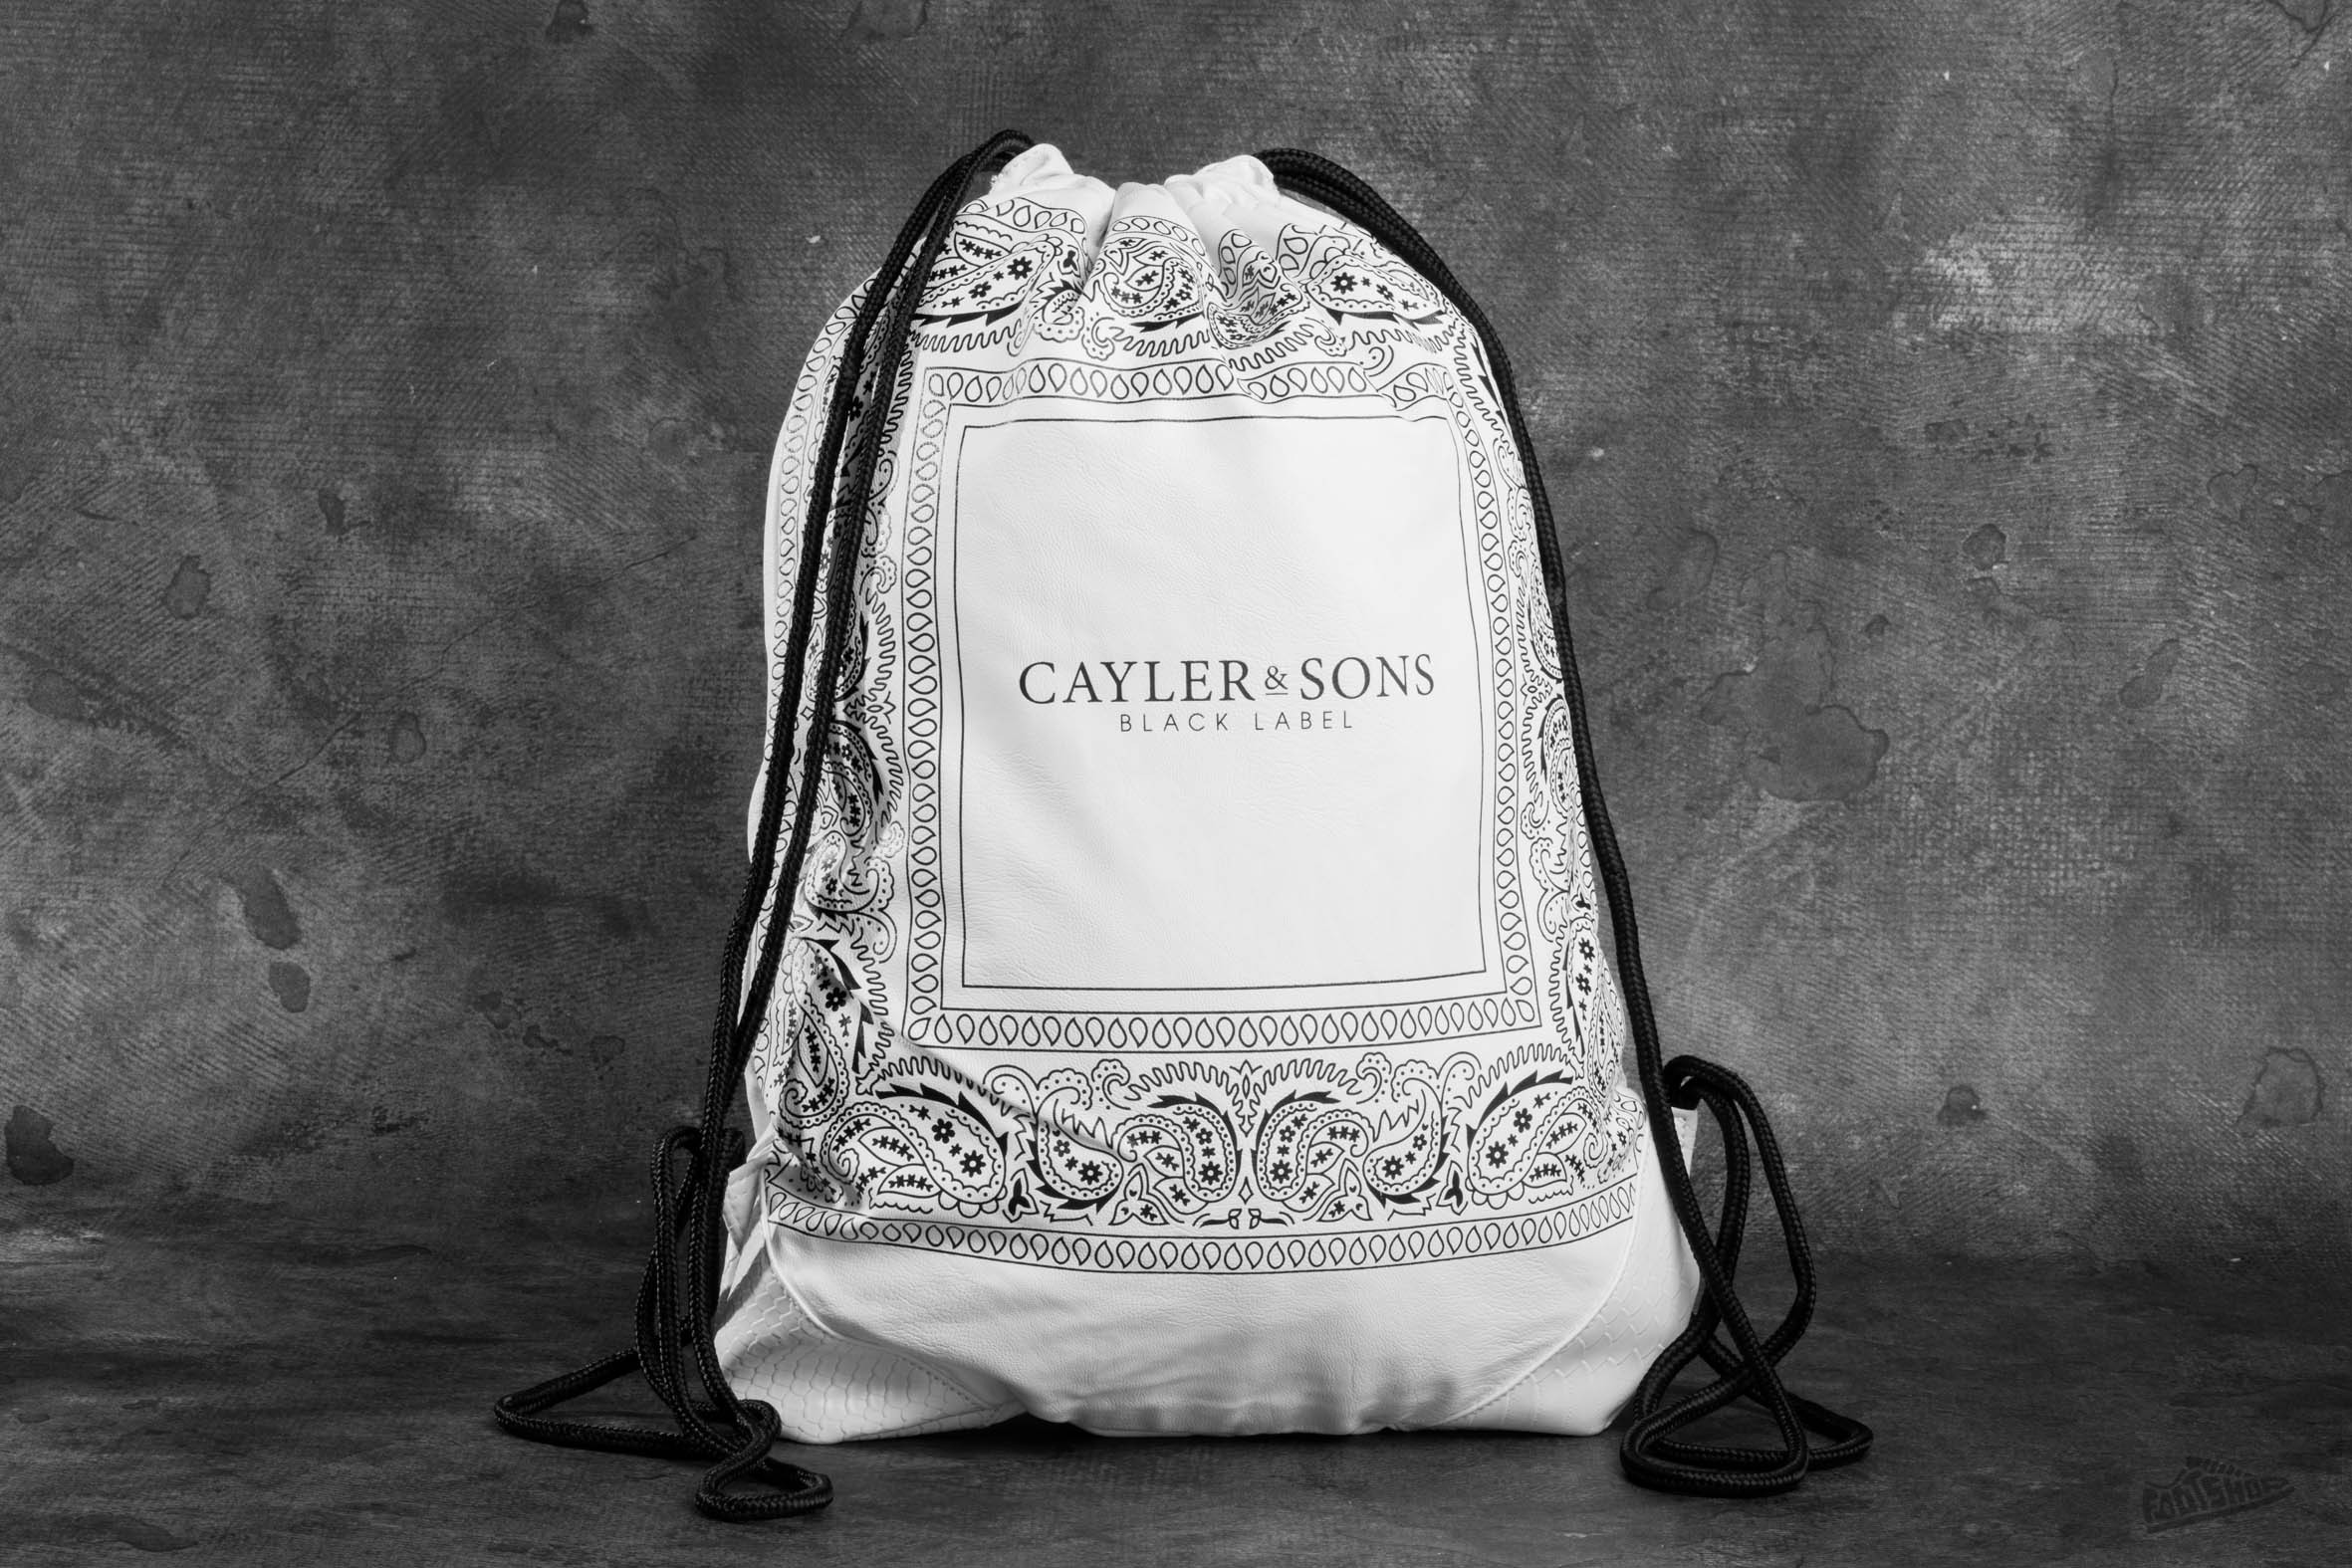 Cayler & Sons BL Paiz Gym Bag White/ Black - 8424